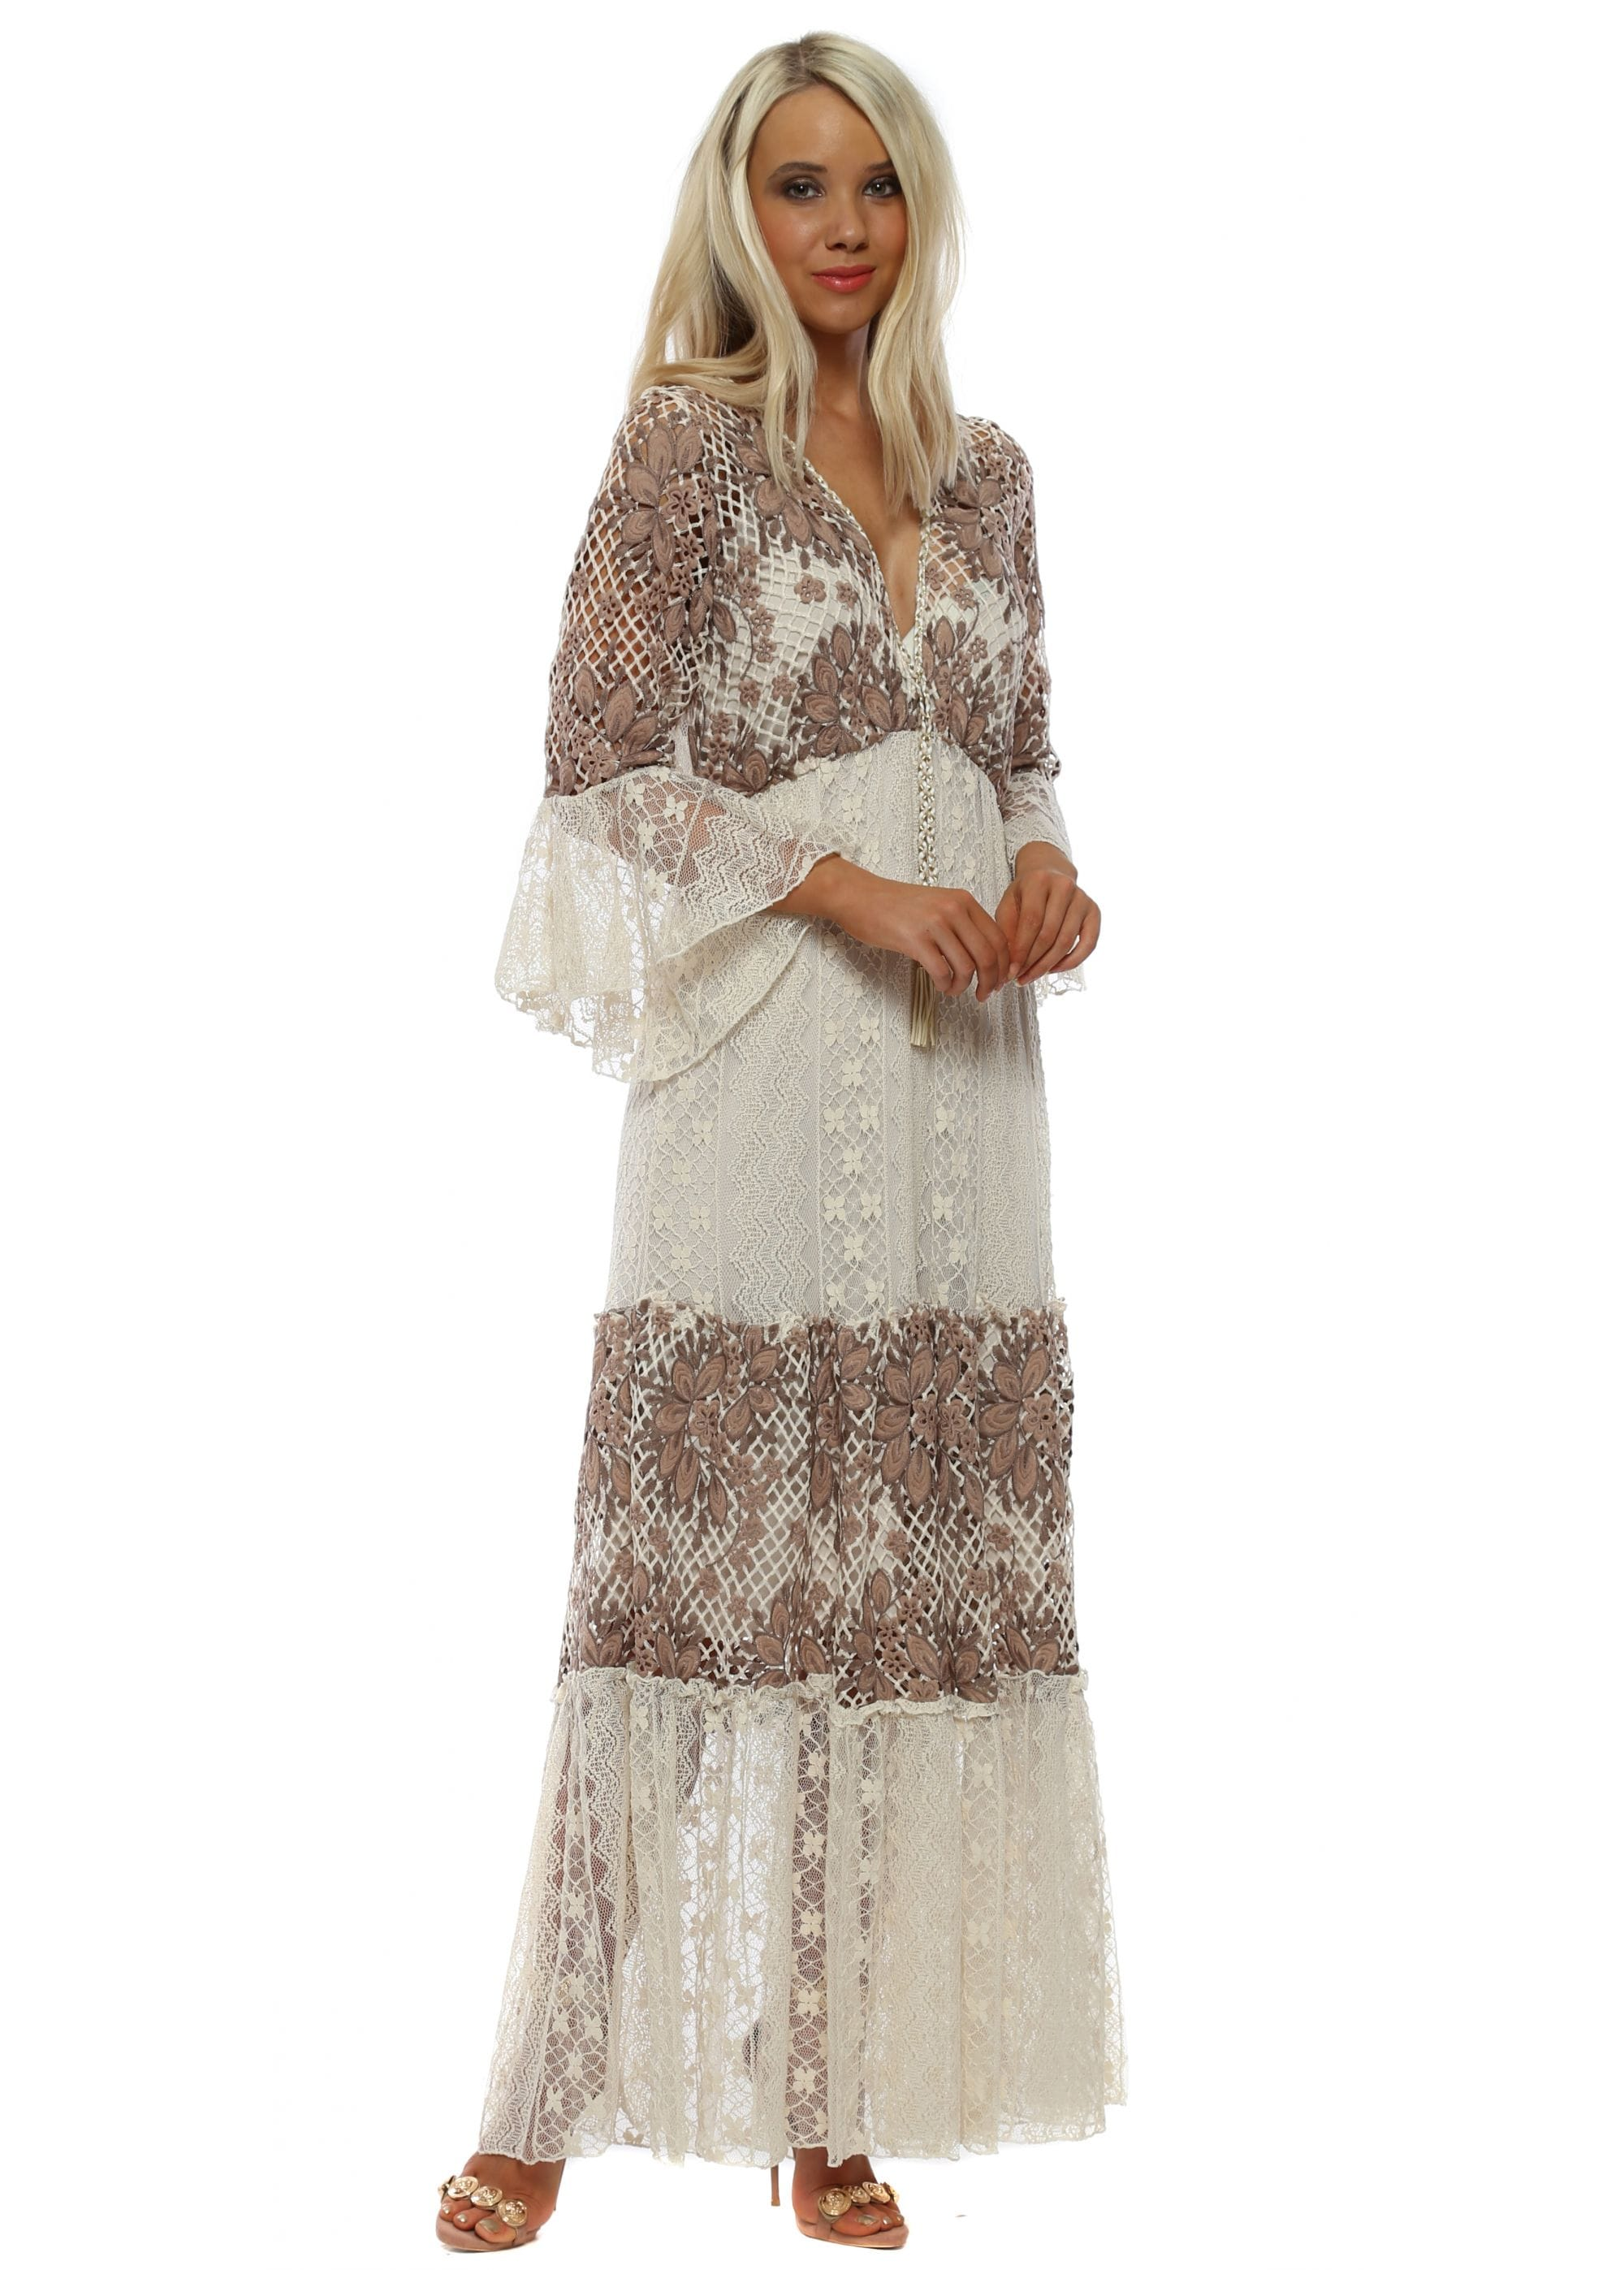 f2cddc6ca4cdde Mocha  amp  Beige Tiered Lace Maxi Dress